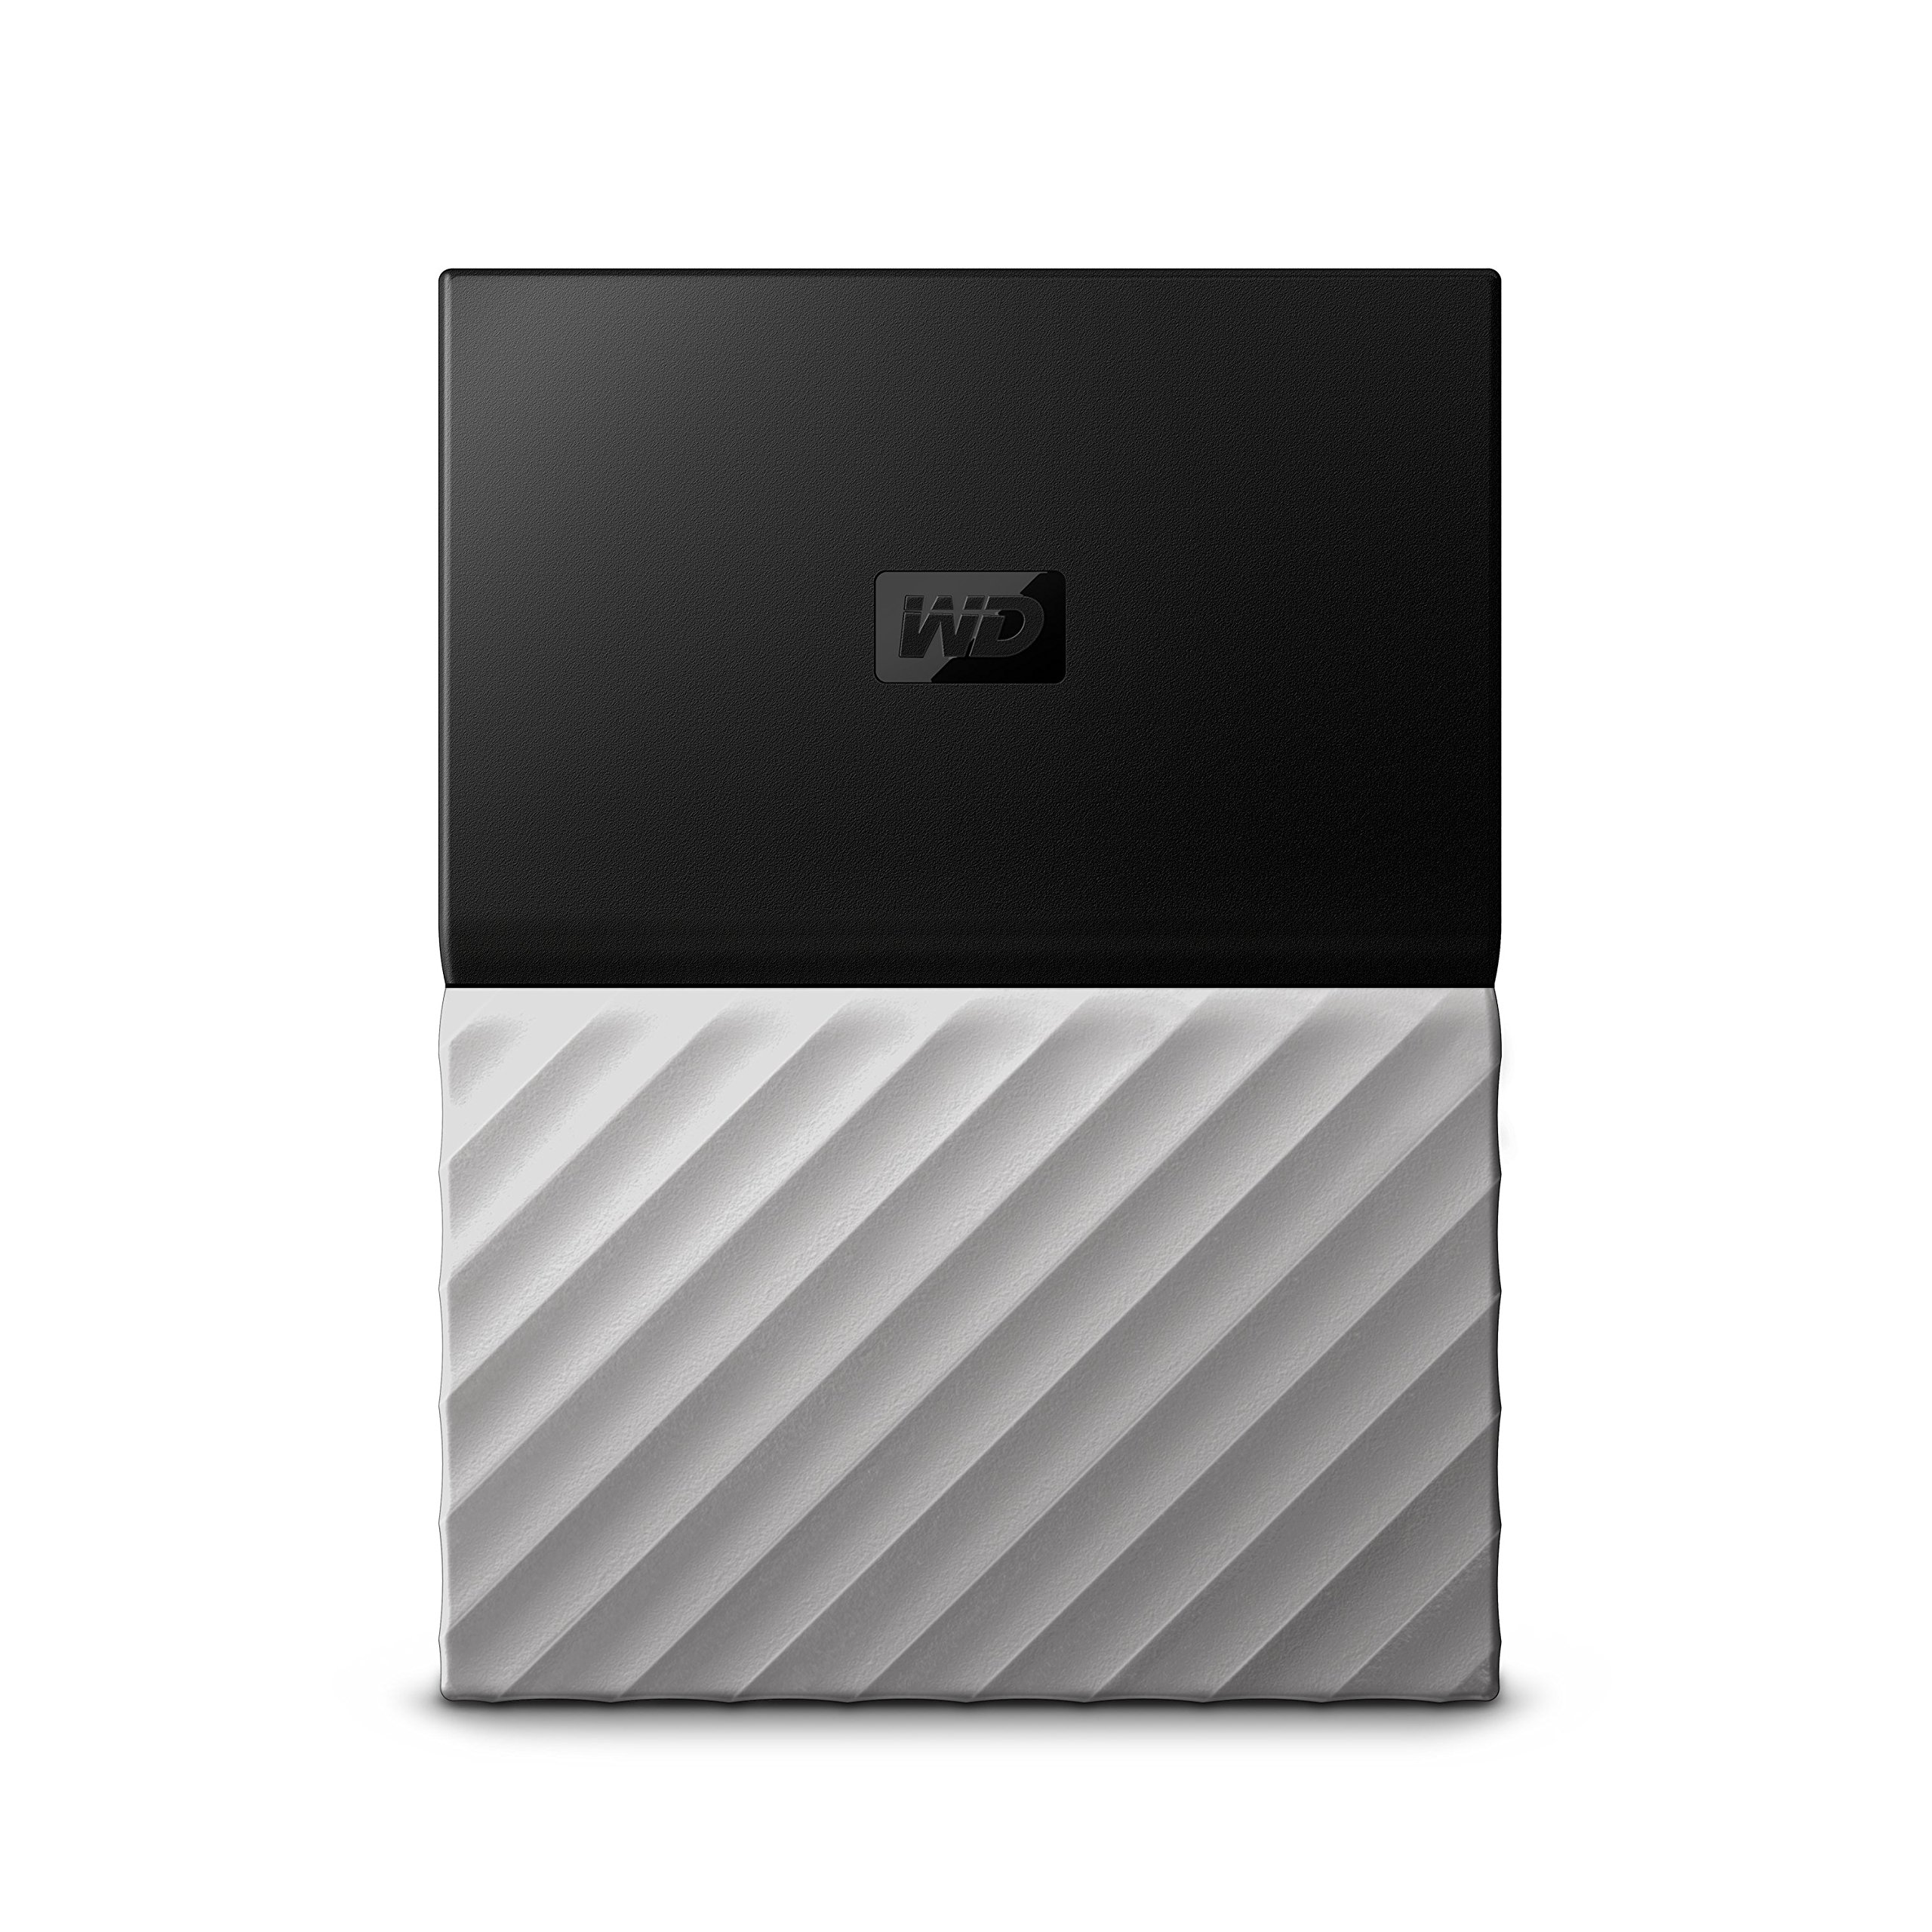 WD 1TB Black-Gray My Passport Ultra Portable External Hard Drive - USB 3.0 - WDBTLG0010BGY-WESN (Old Generation) by Western Digital (Image #1)